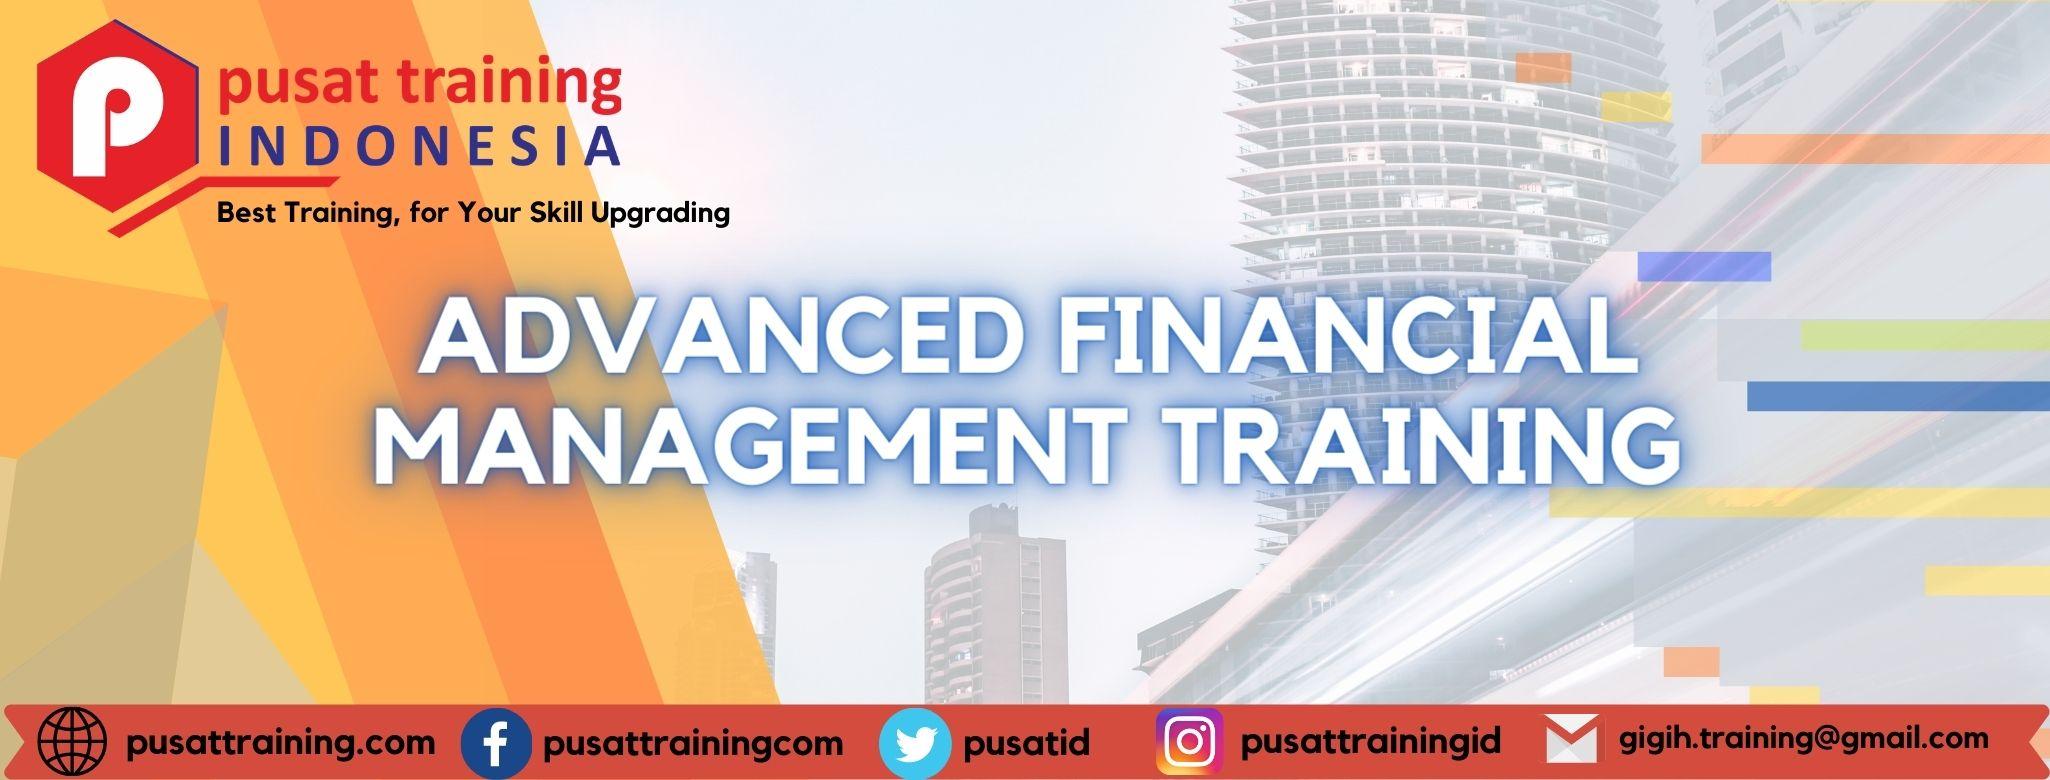 advance-financial-management-training